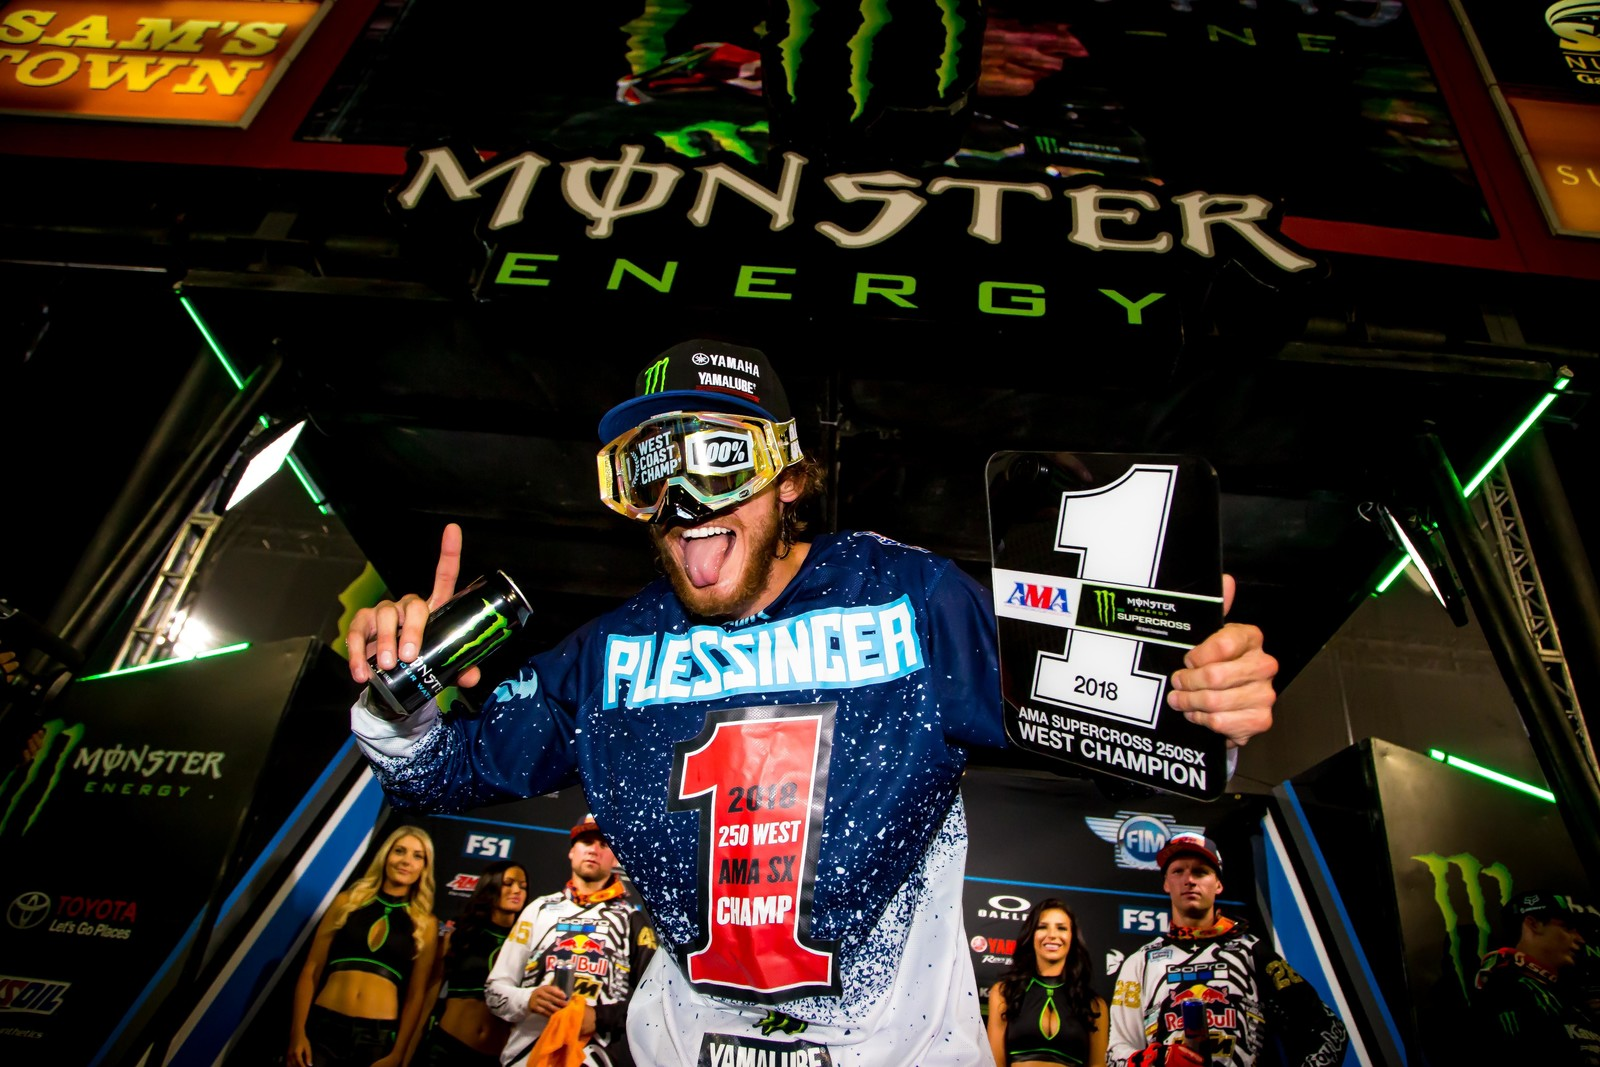 THOR's Aaron Plessinger – 250 Supercross West Coast Regional Champion